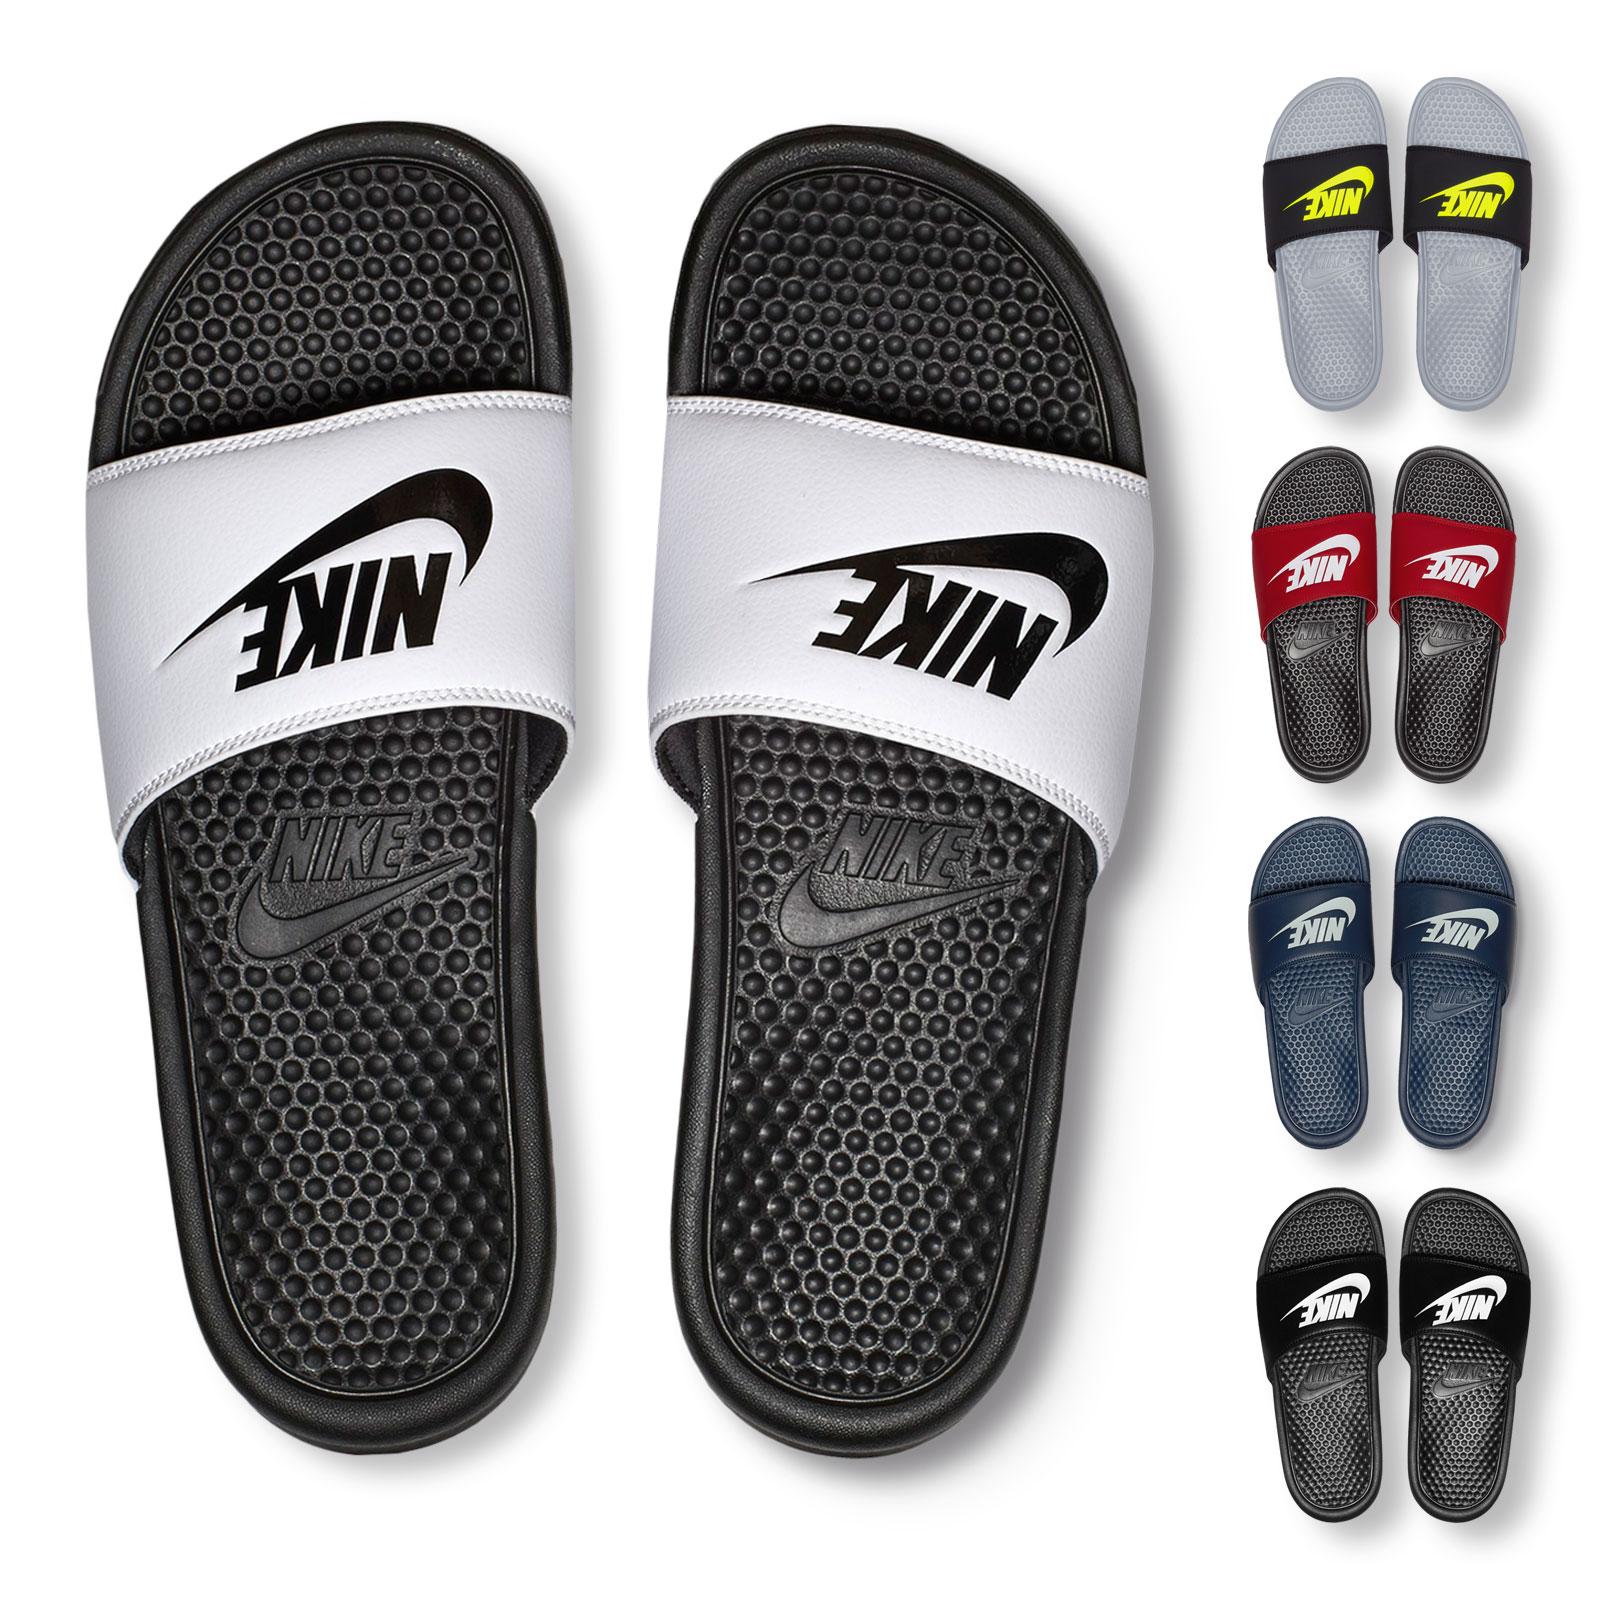 Beca Por cierto Leer  Nike Badeschuhe Benassi JDI | Bonvenon Webshop